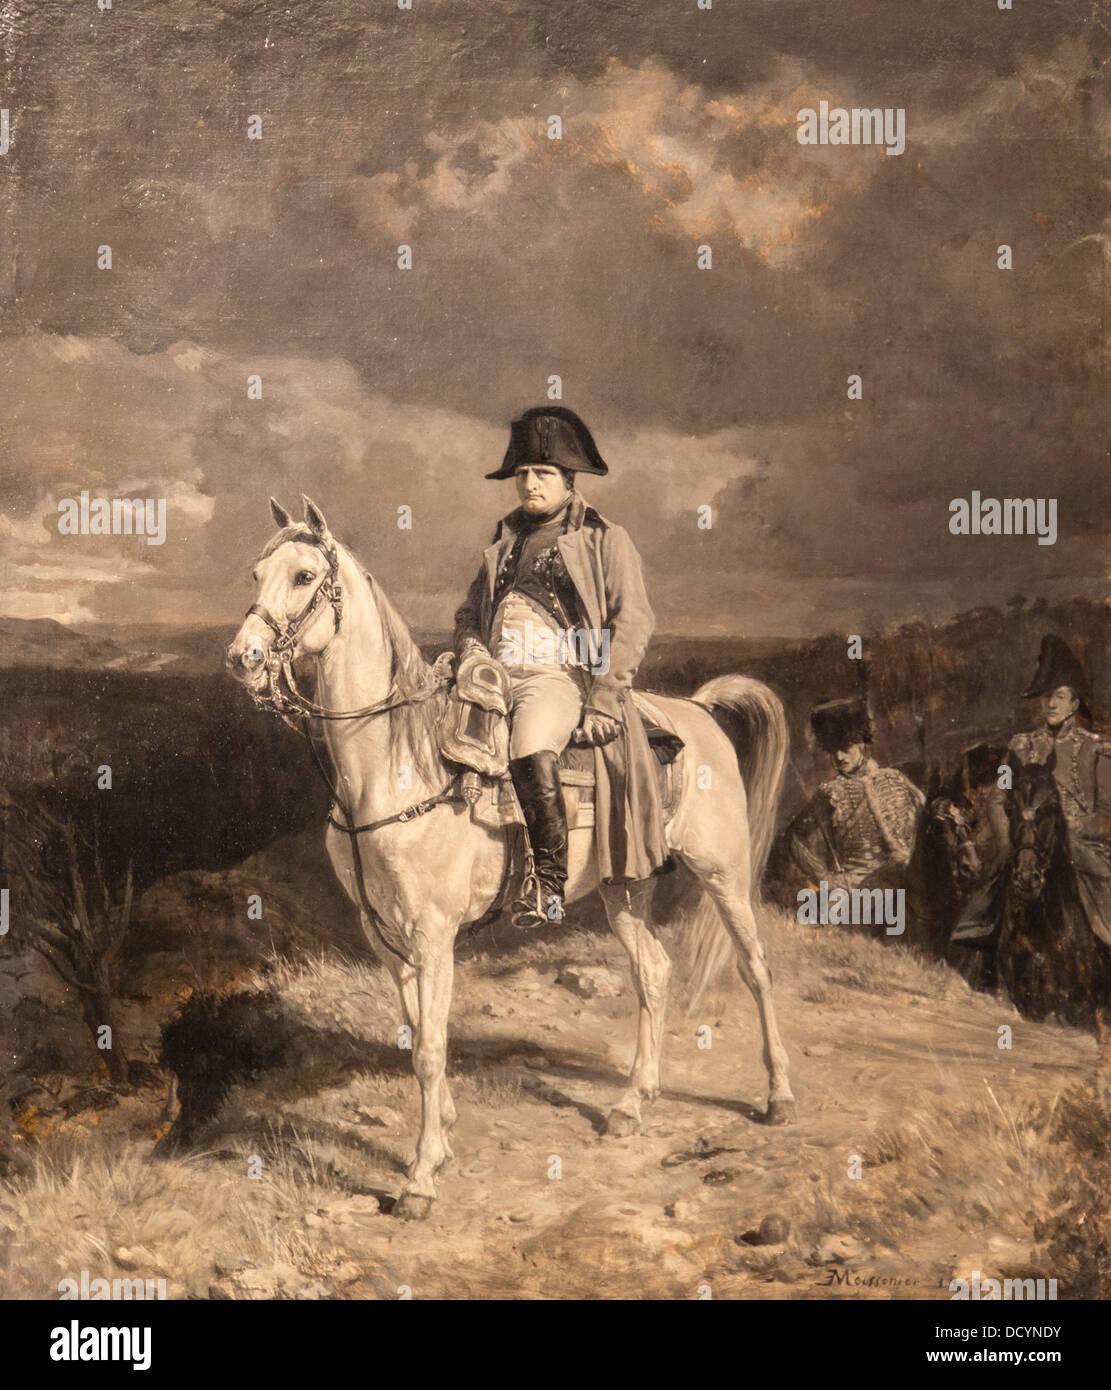 Siglo xix - Napoleón en 1814 - Jean-Louis Ernest Meissonier (1863) - Paris Francia - Óleo sobre lienzo Foto de stock